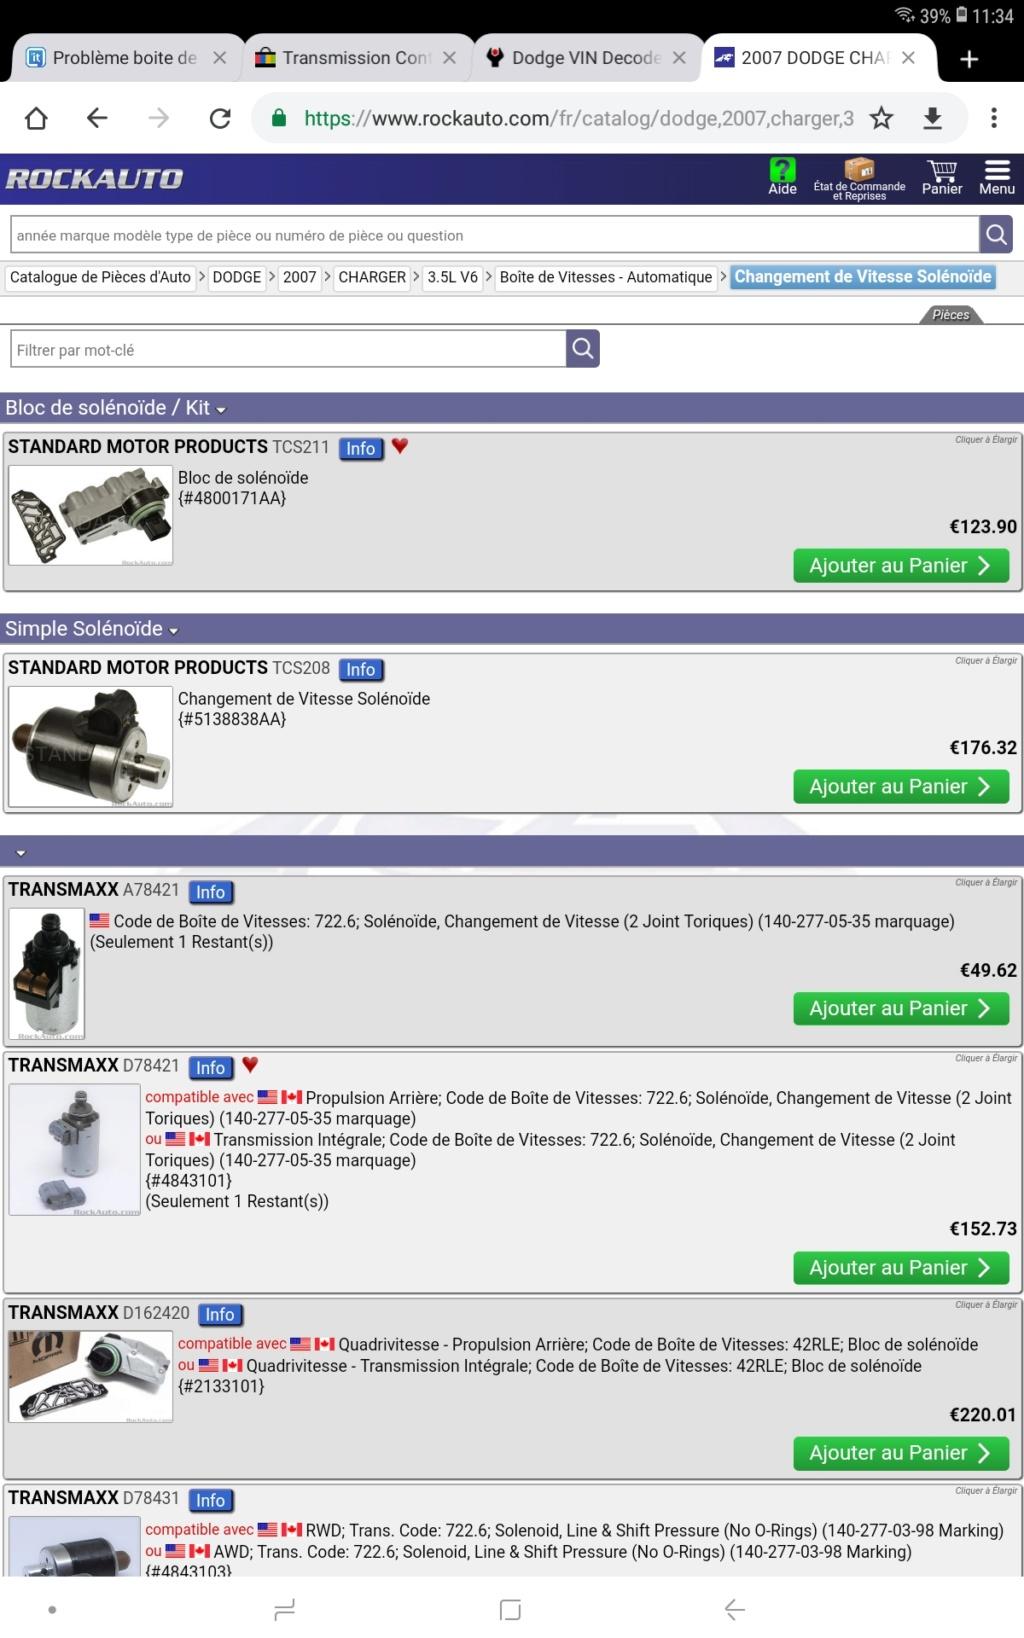 Problème boite de vitesse Dodge Charger 3.5 v6 2007 Screen12